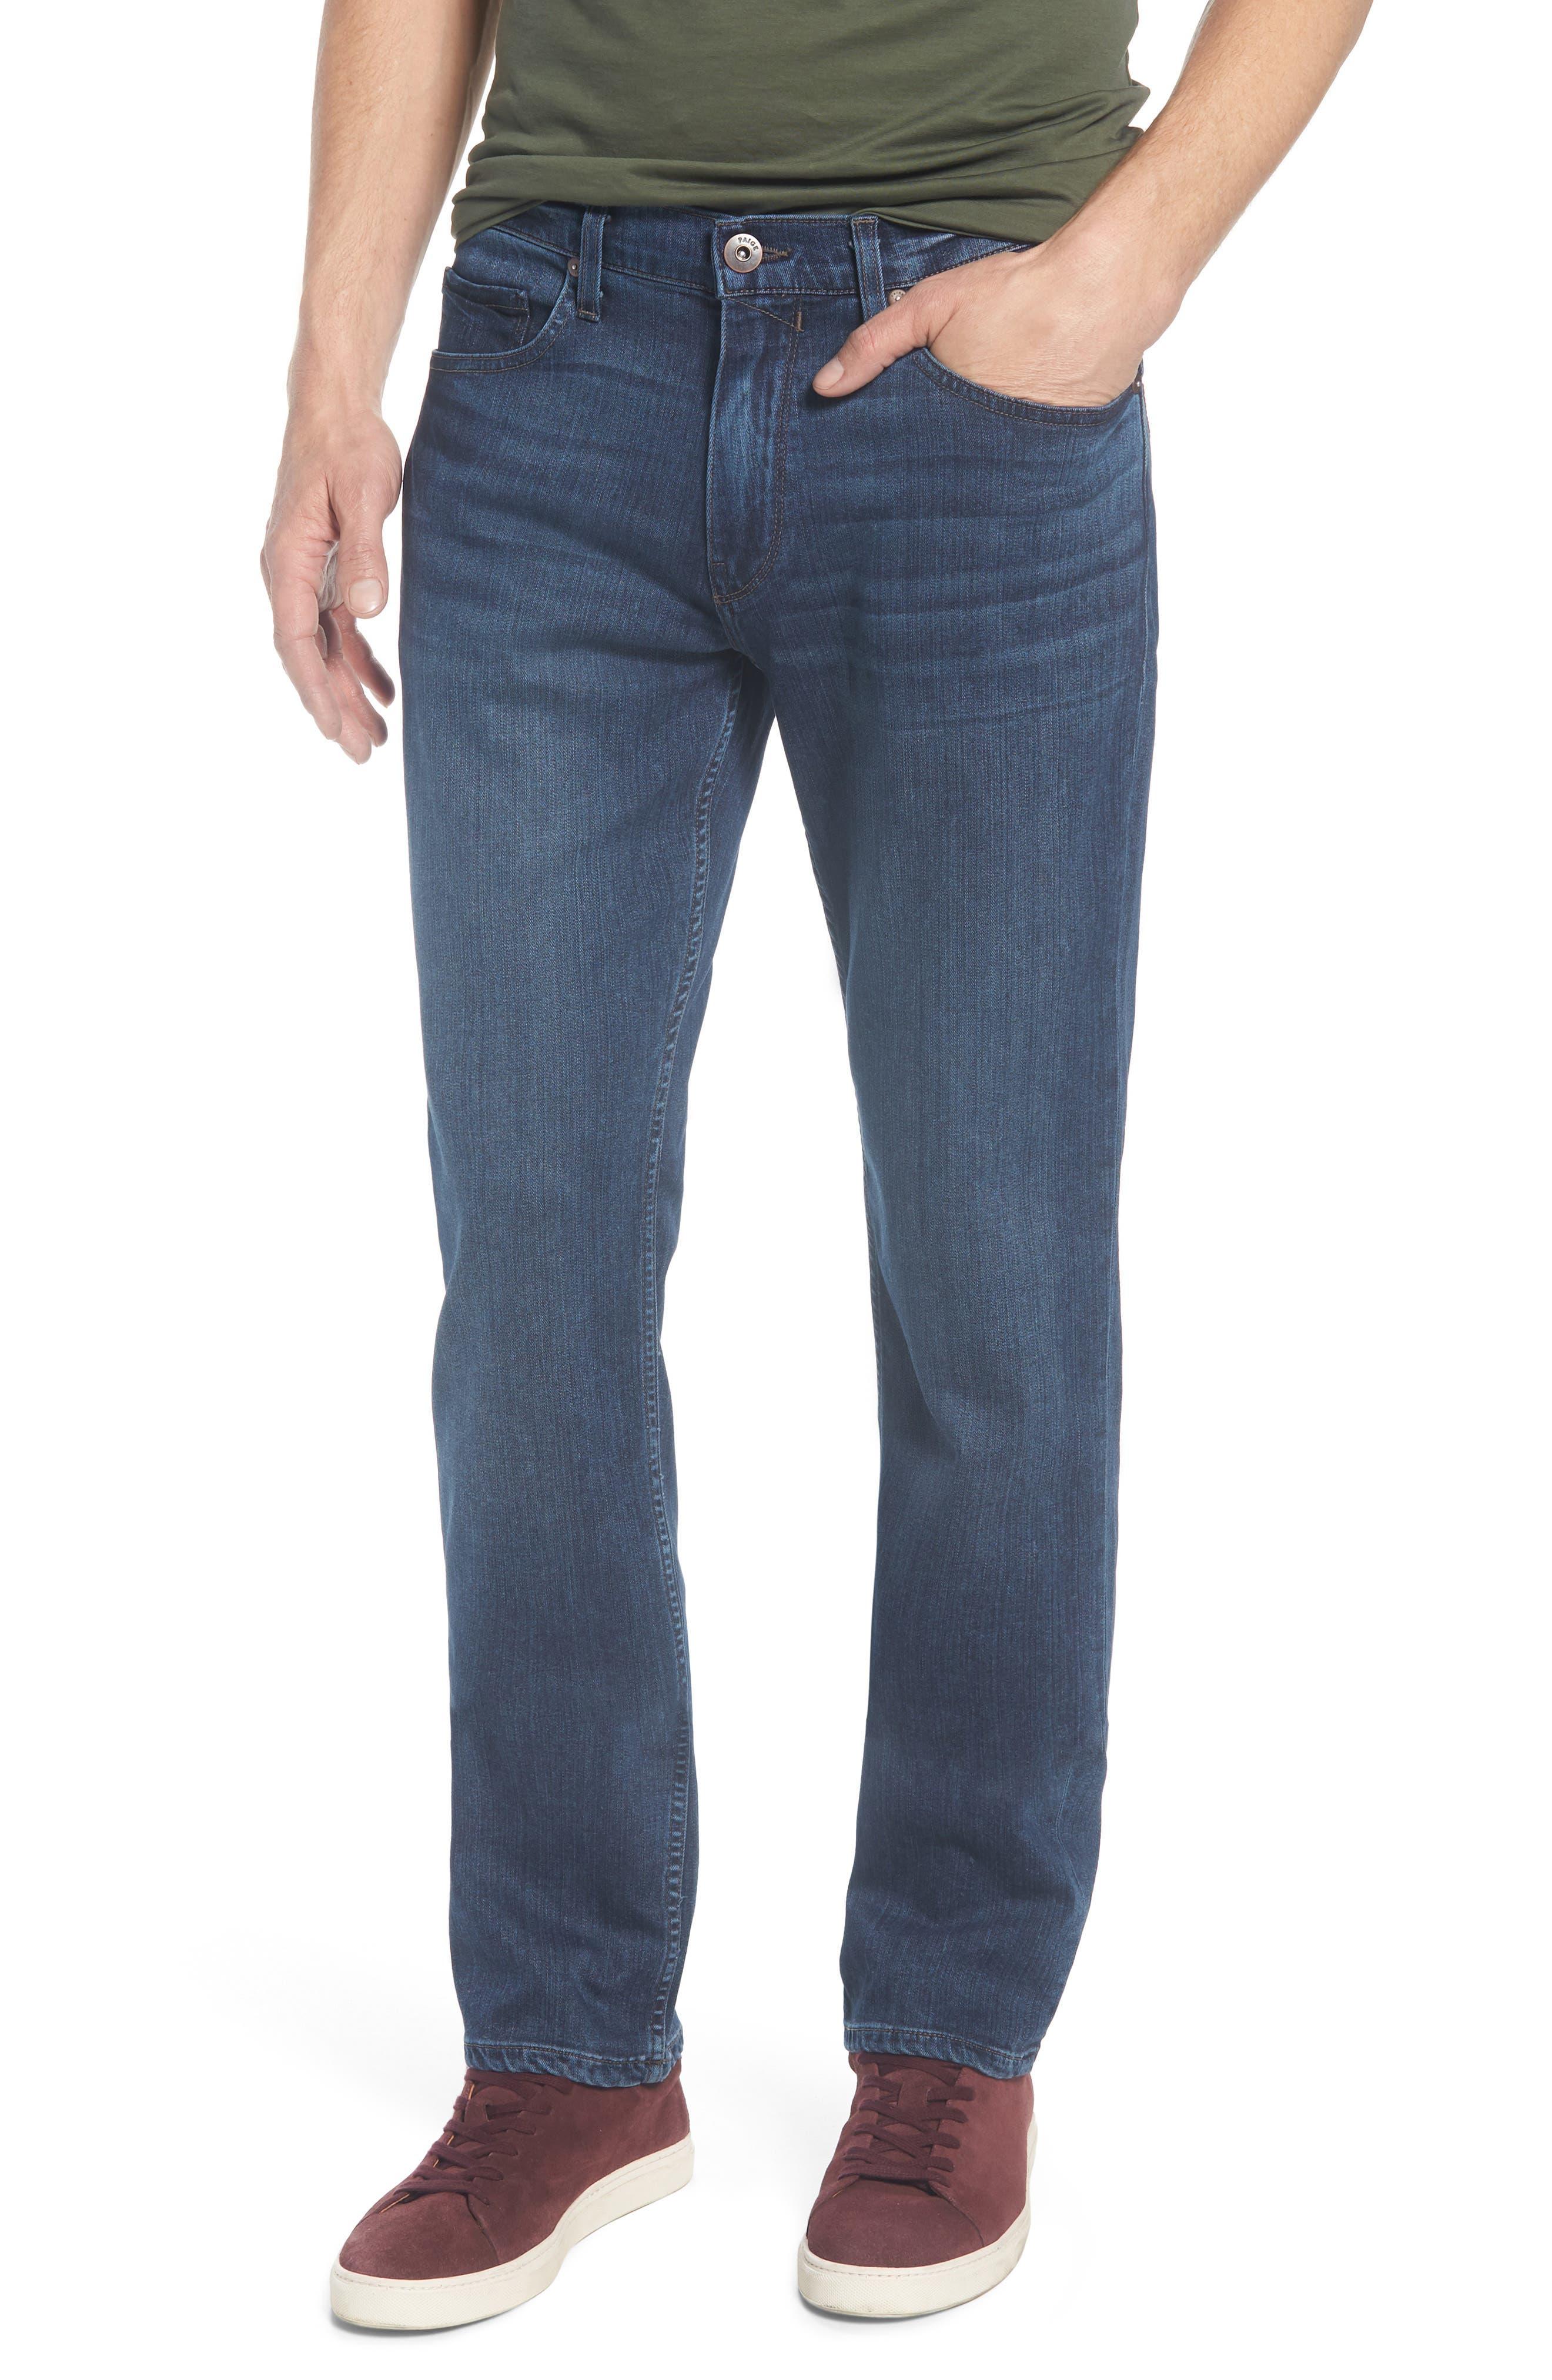 Normandie Straight Leg Jeans,                             Main thumbnail 1, color,                             400